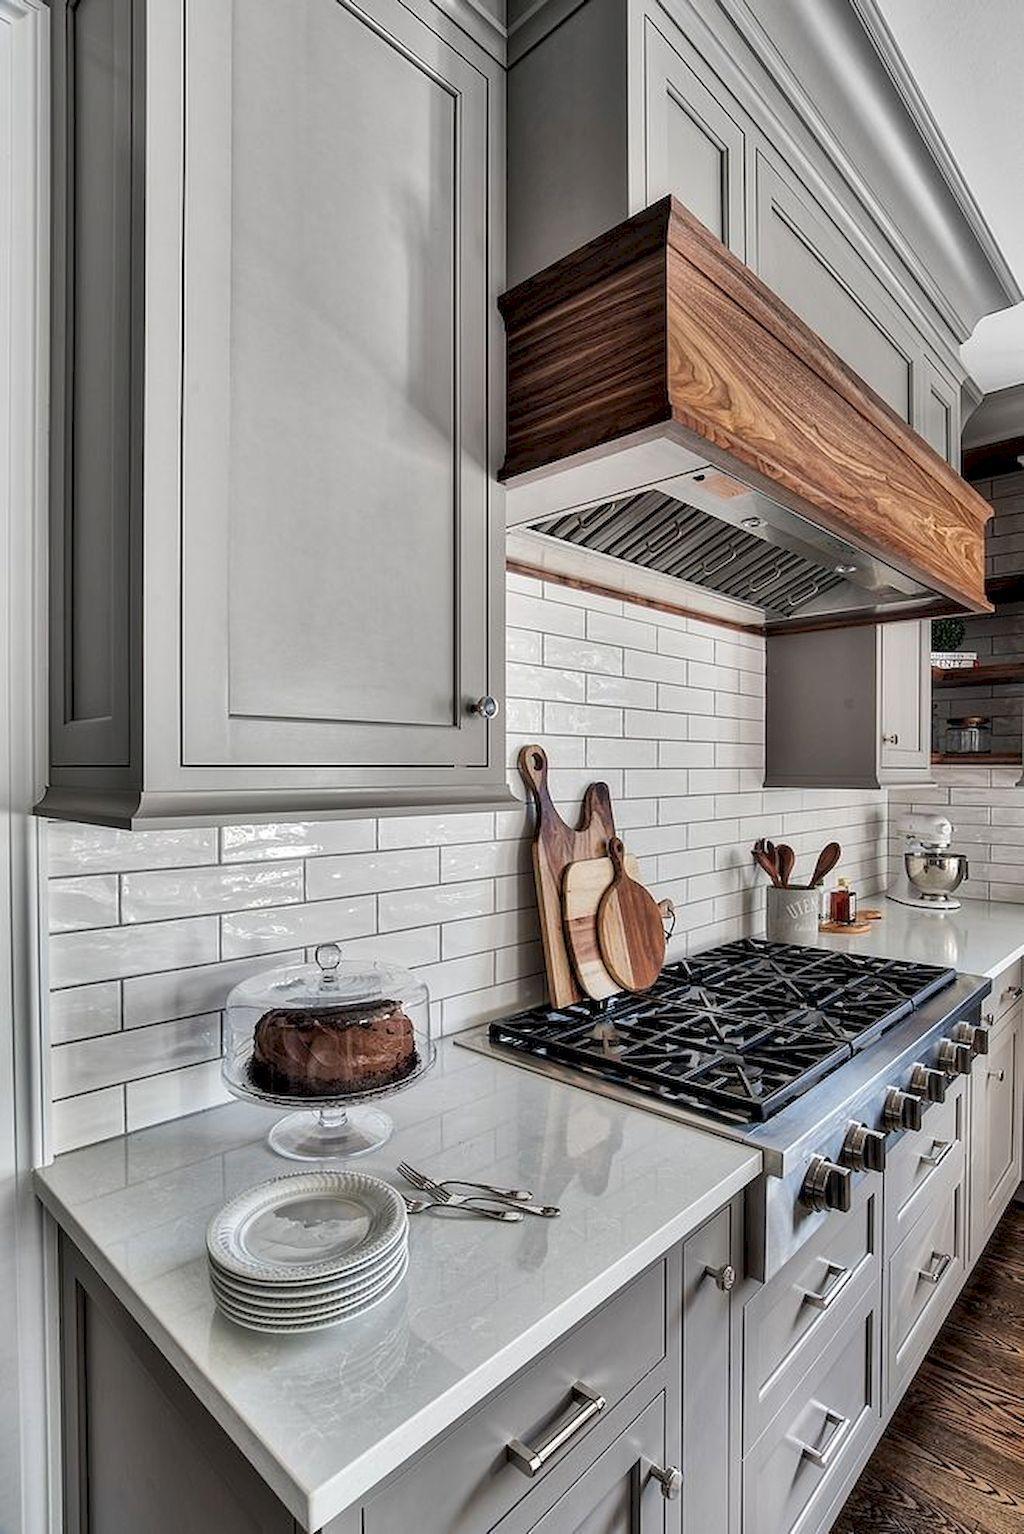 Stunning Backsplash Ideas for Neutral Color Kitchen | Grey ...